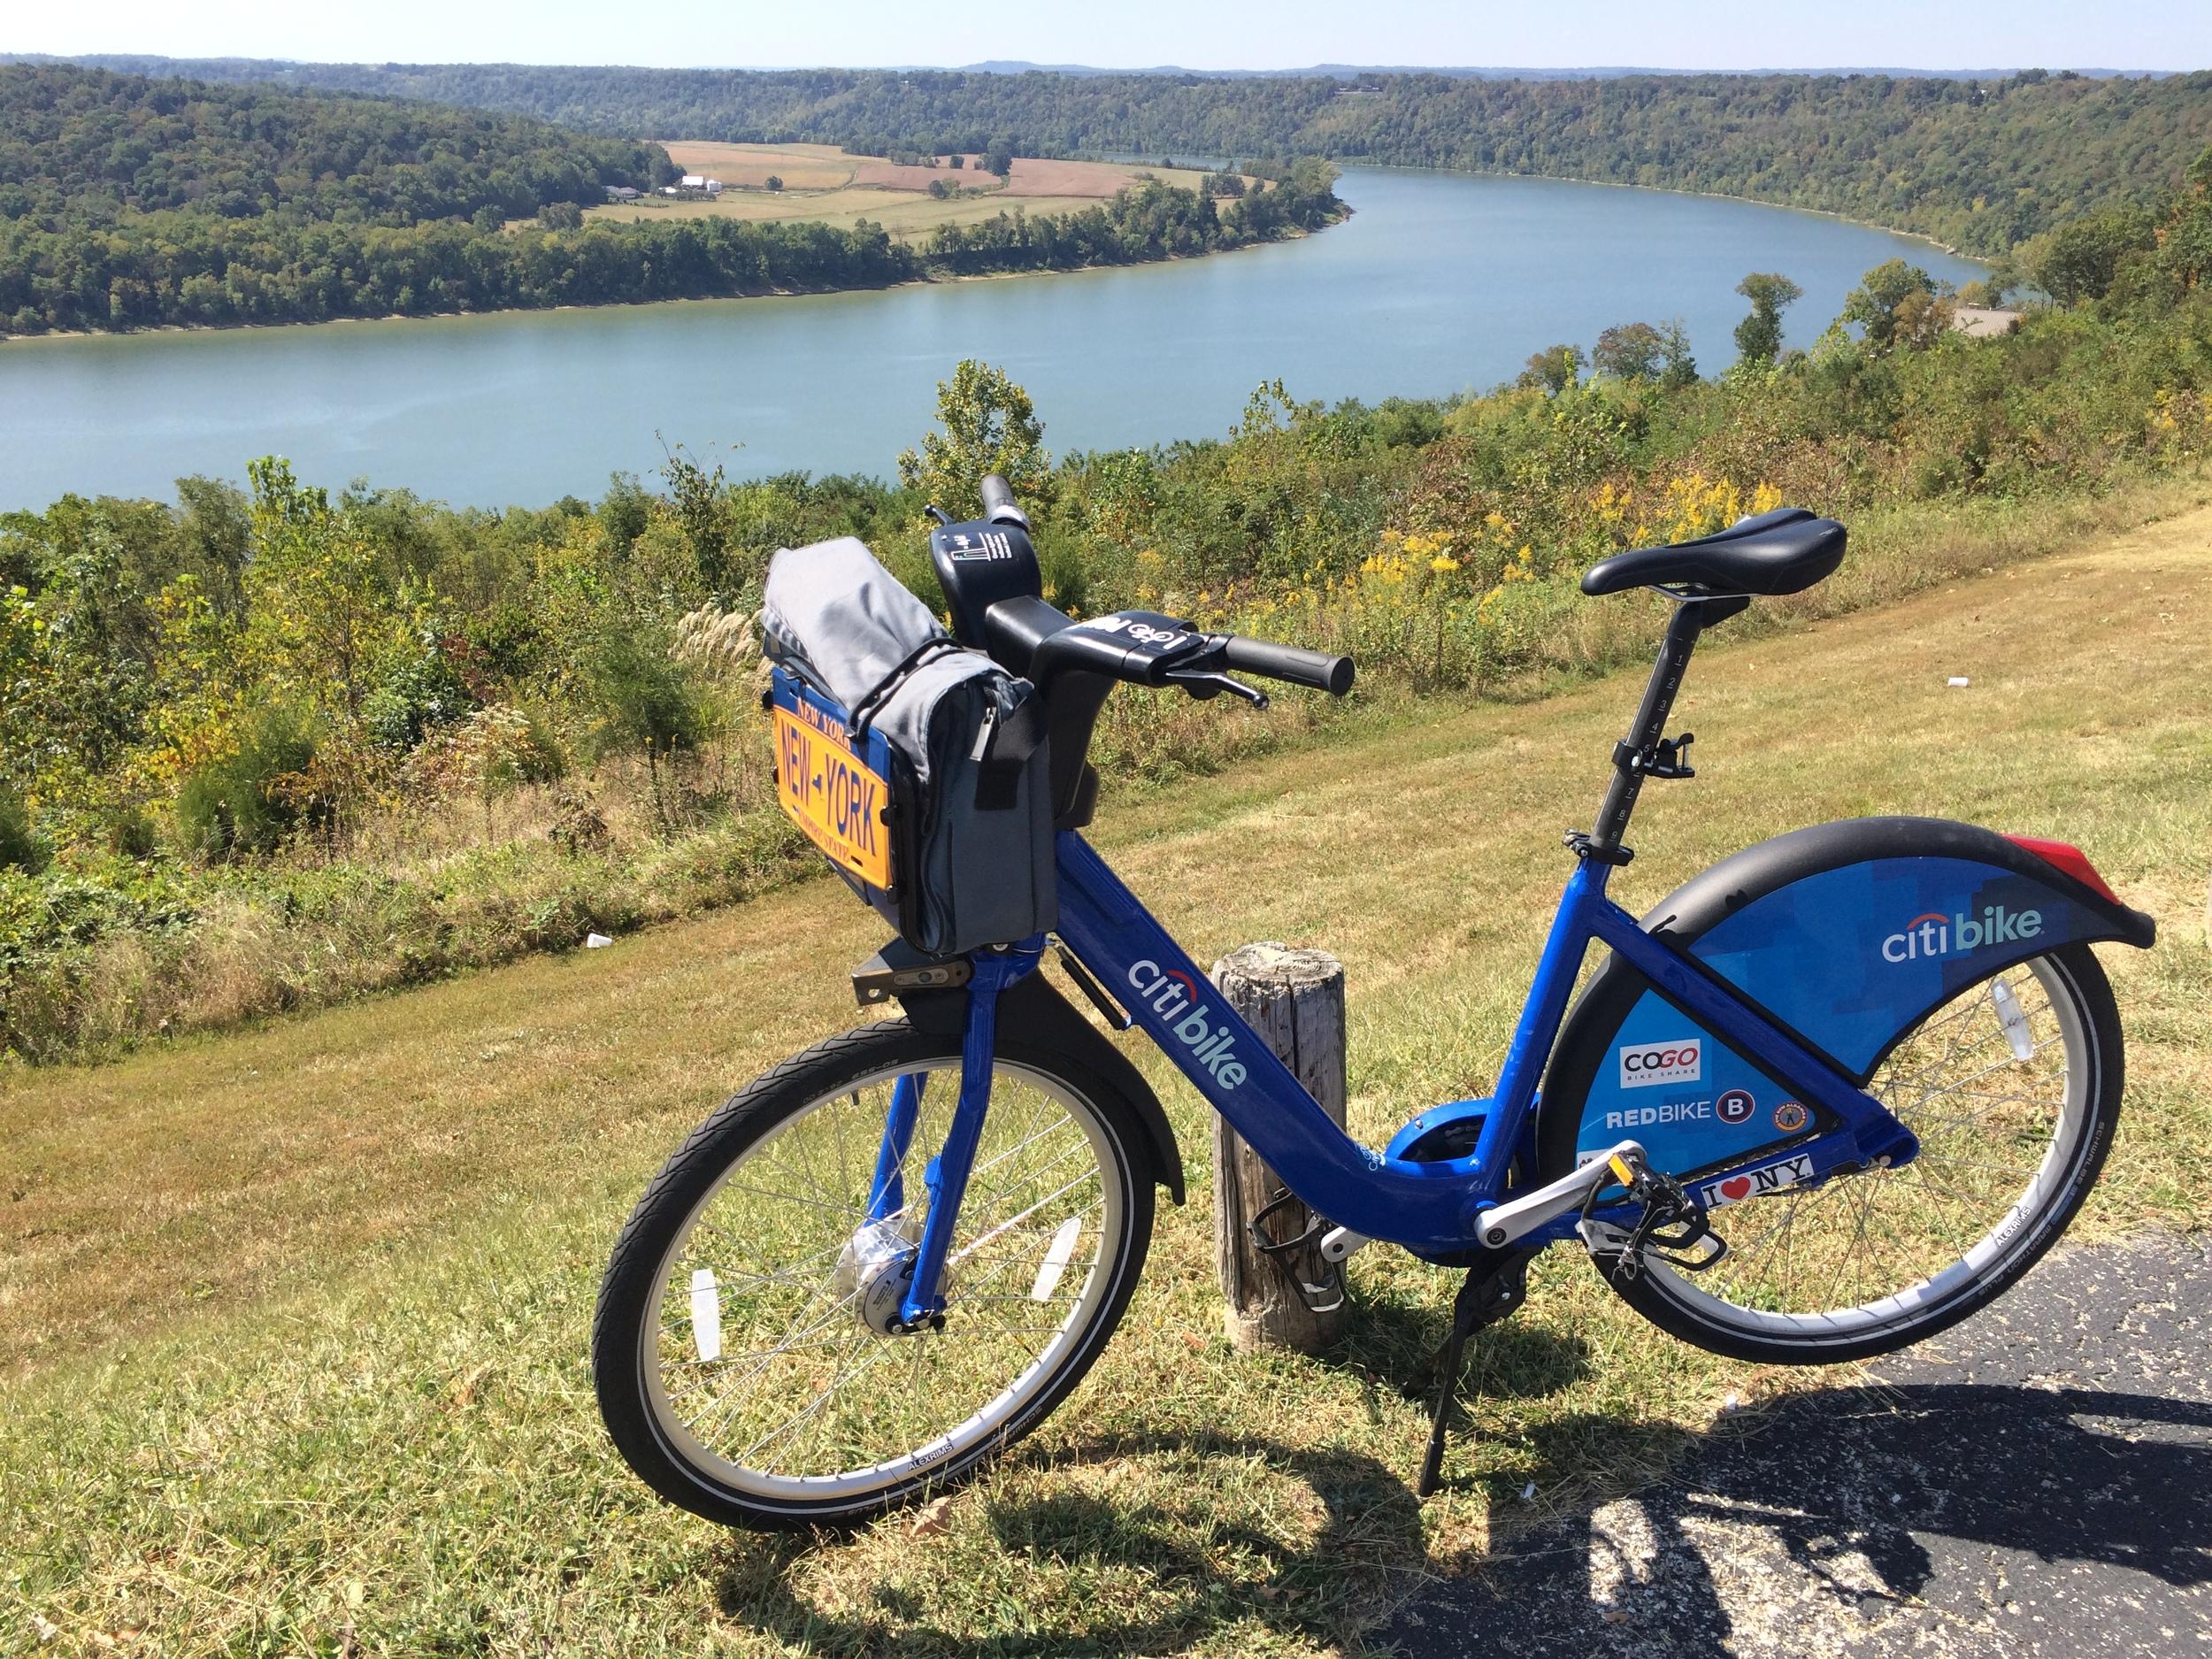 1,000 miles: Leavenworth, Indiana above the Ohio River